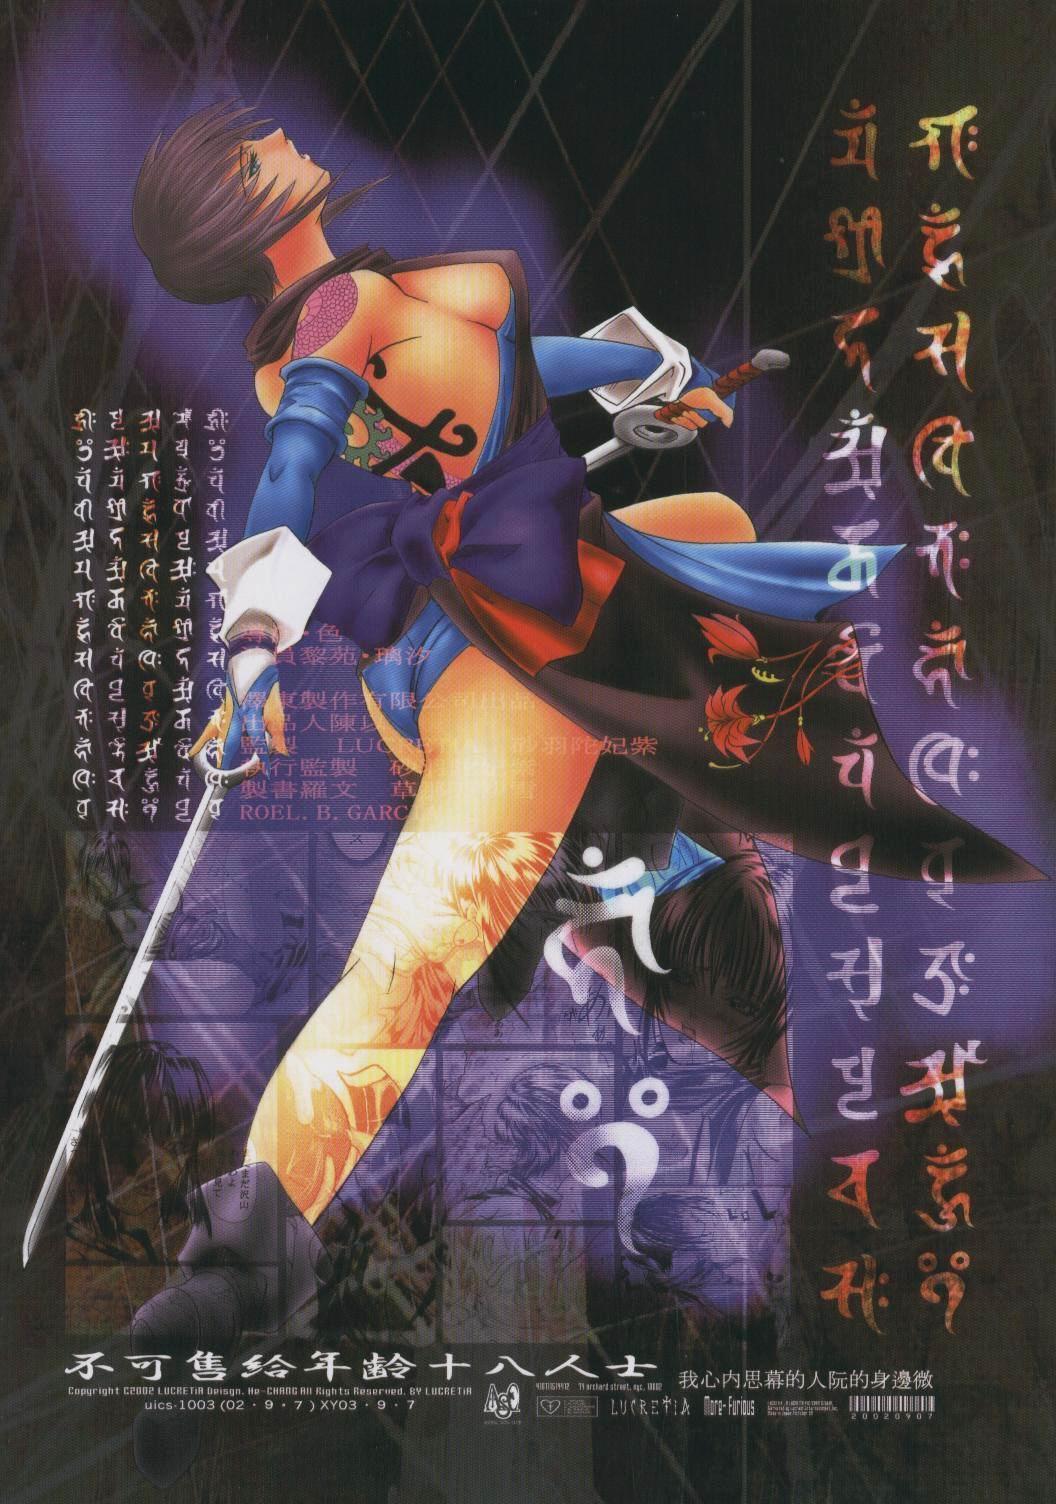 [LUCRETiA (Hiichan)] Ken-Jyuu Retouch Version - Le sexe dur avec l'animal. numero:03 (Samurai Spirits) 32